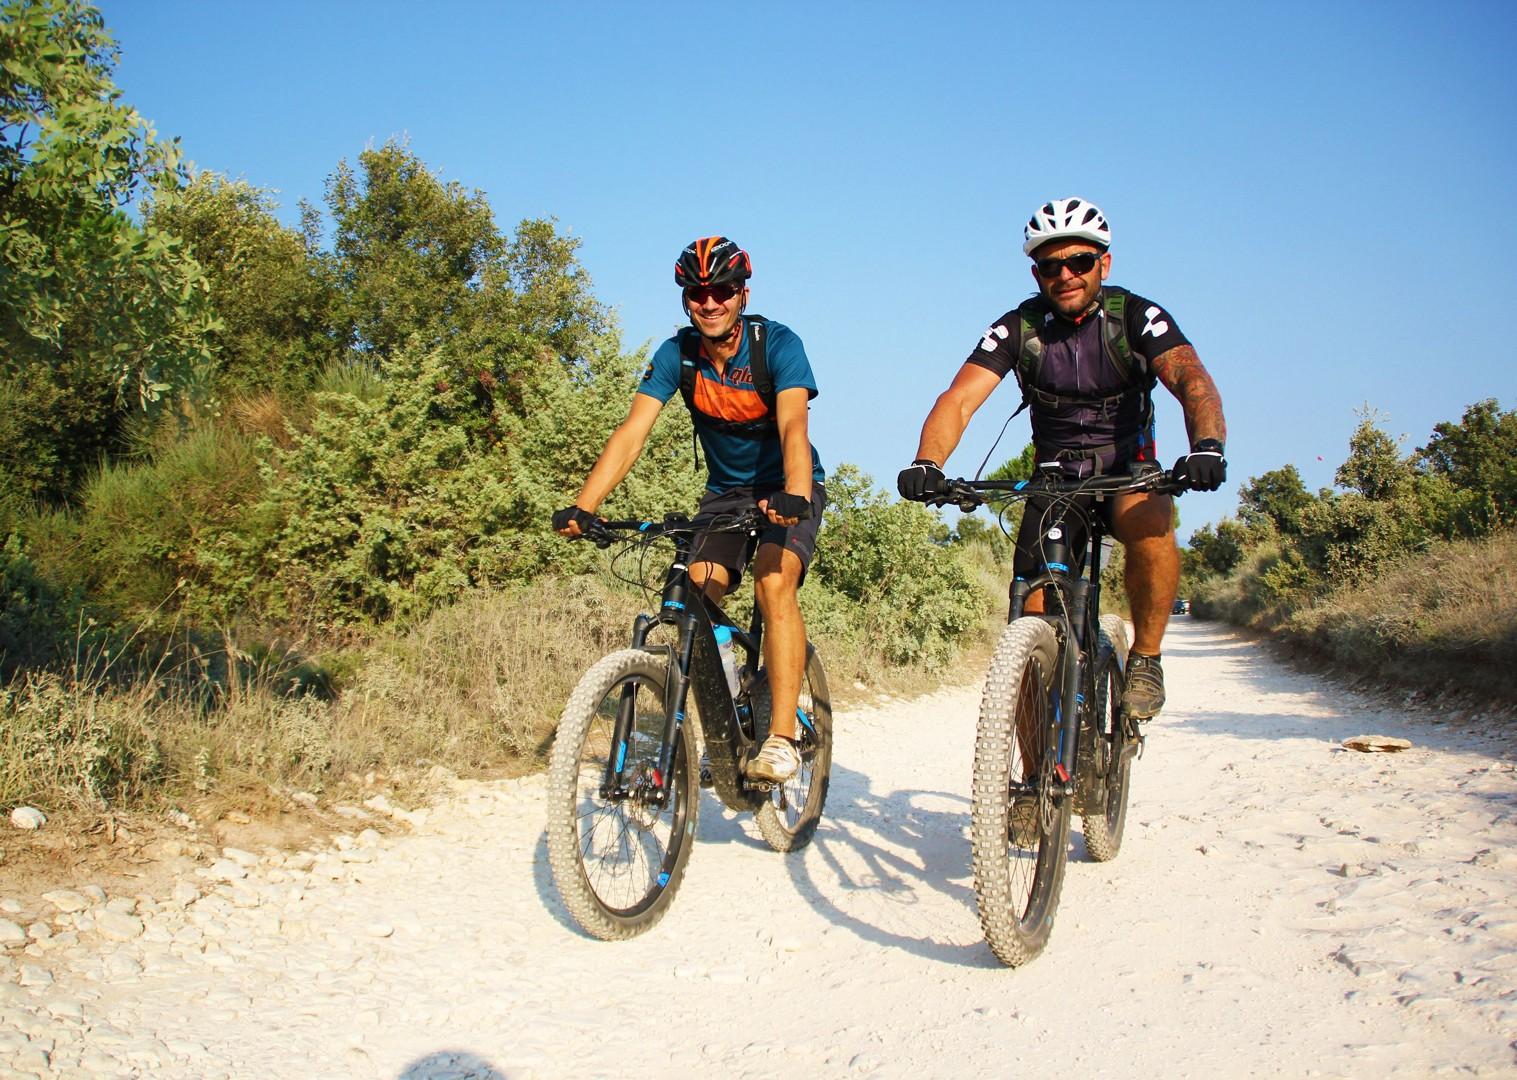 parenzana-saddle-skedaddle-electric-mountain-biking-holiday-croatia-terra-magica.jpg - NEW! Croatia - Terra Magica - eMTB - Mountain Biking